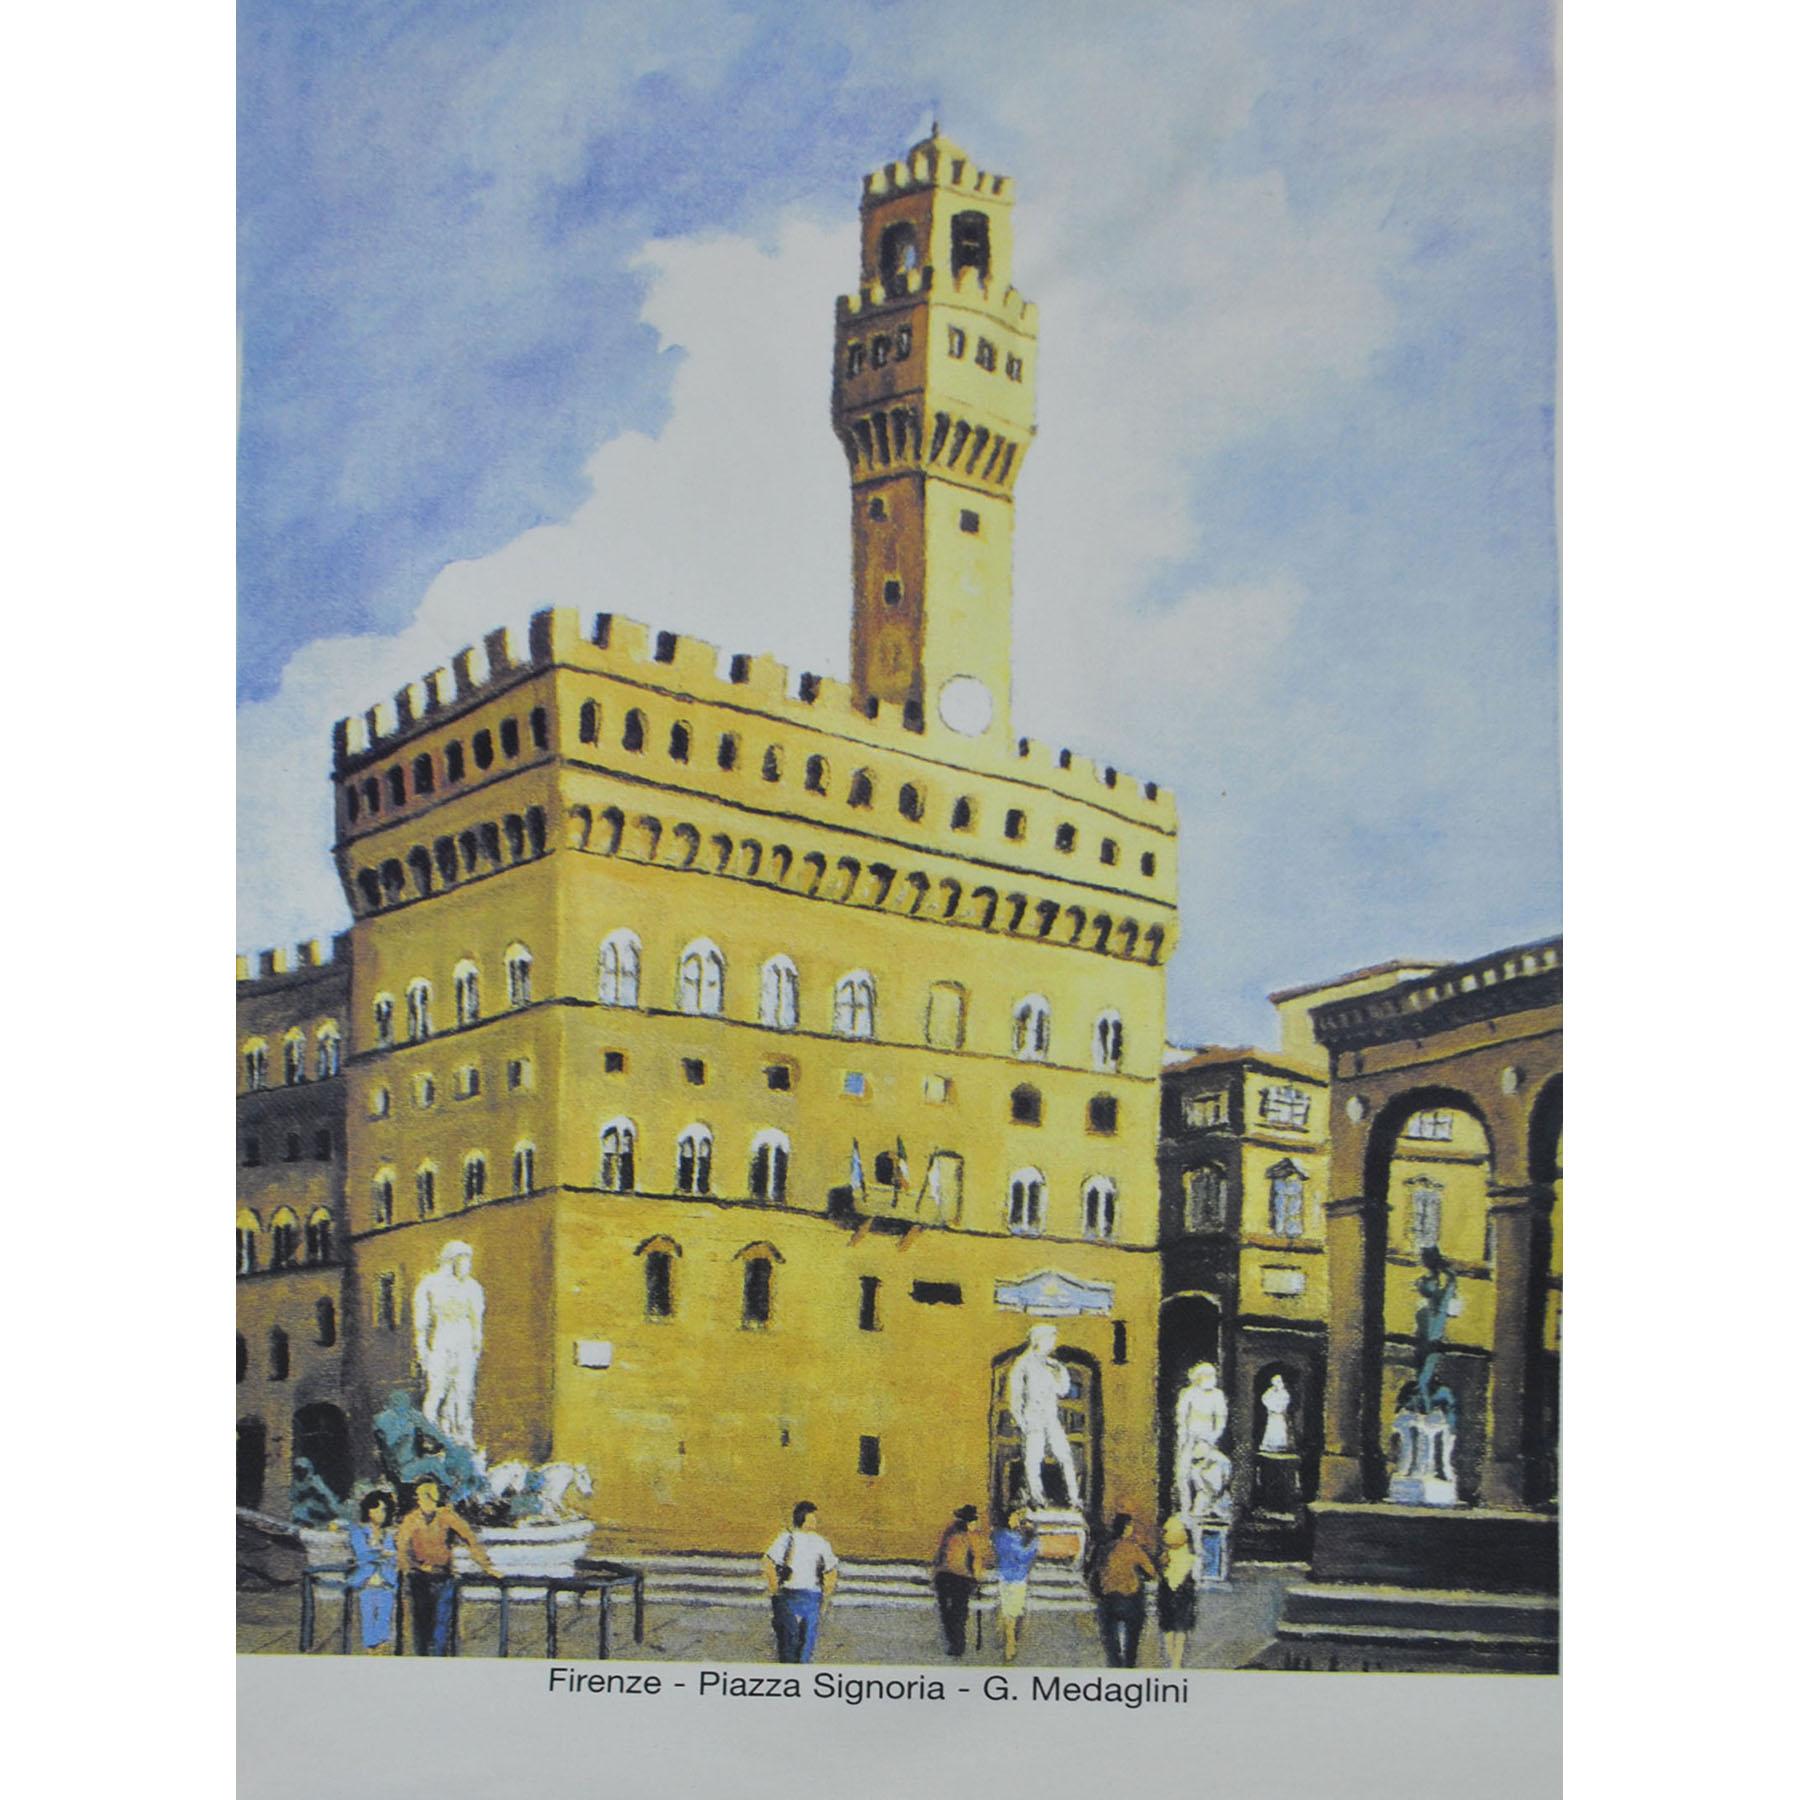 Maler Panneaux 84,5 x 63,5 cm   G. Medaglini - Florenz - Piazza Signoria